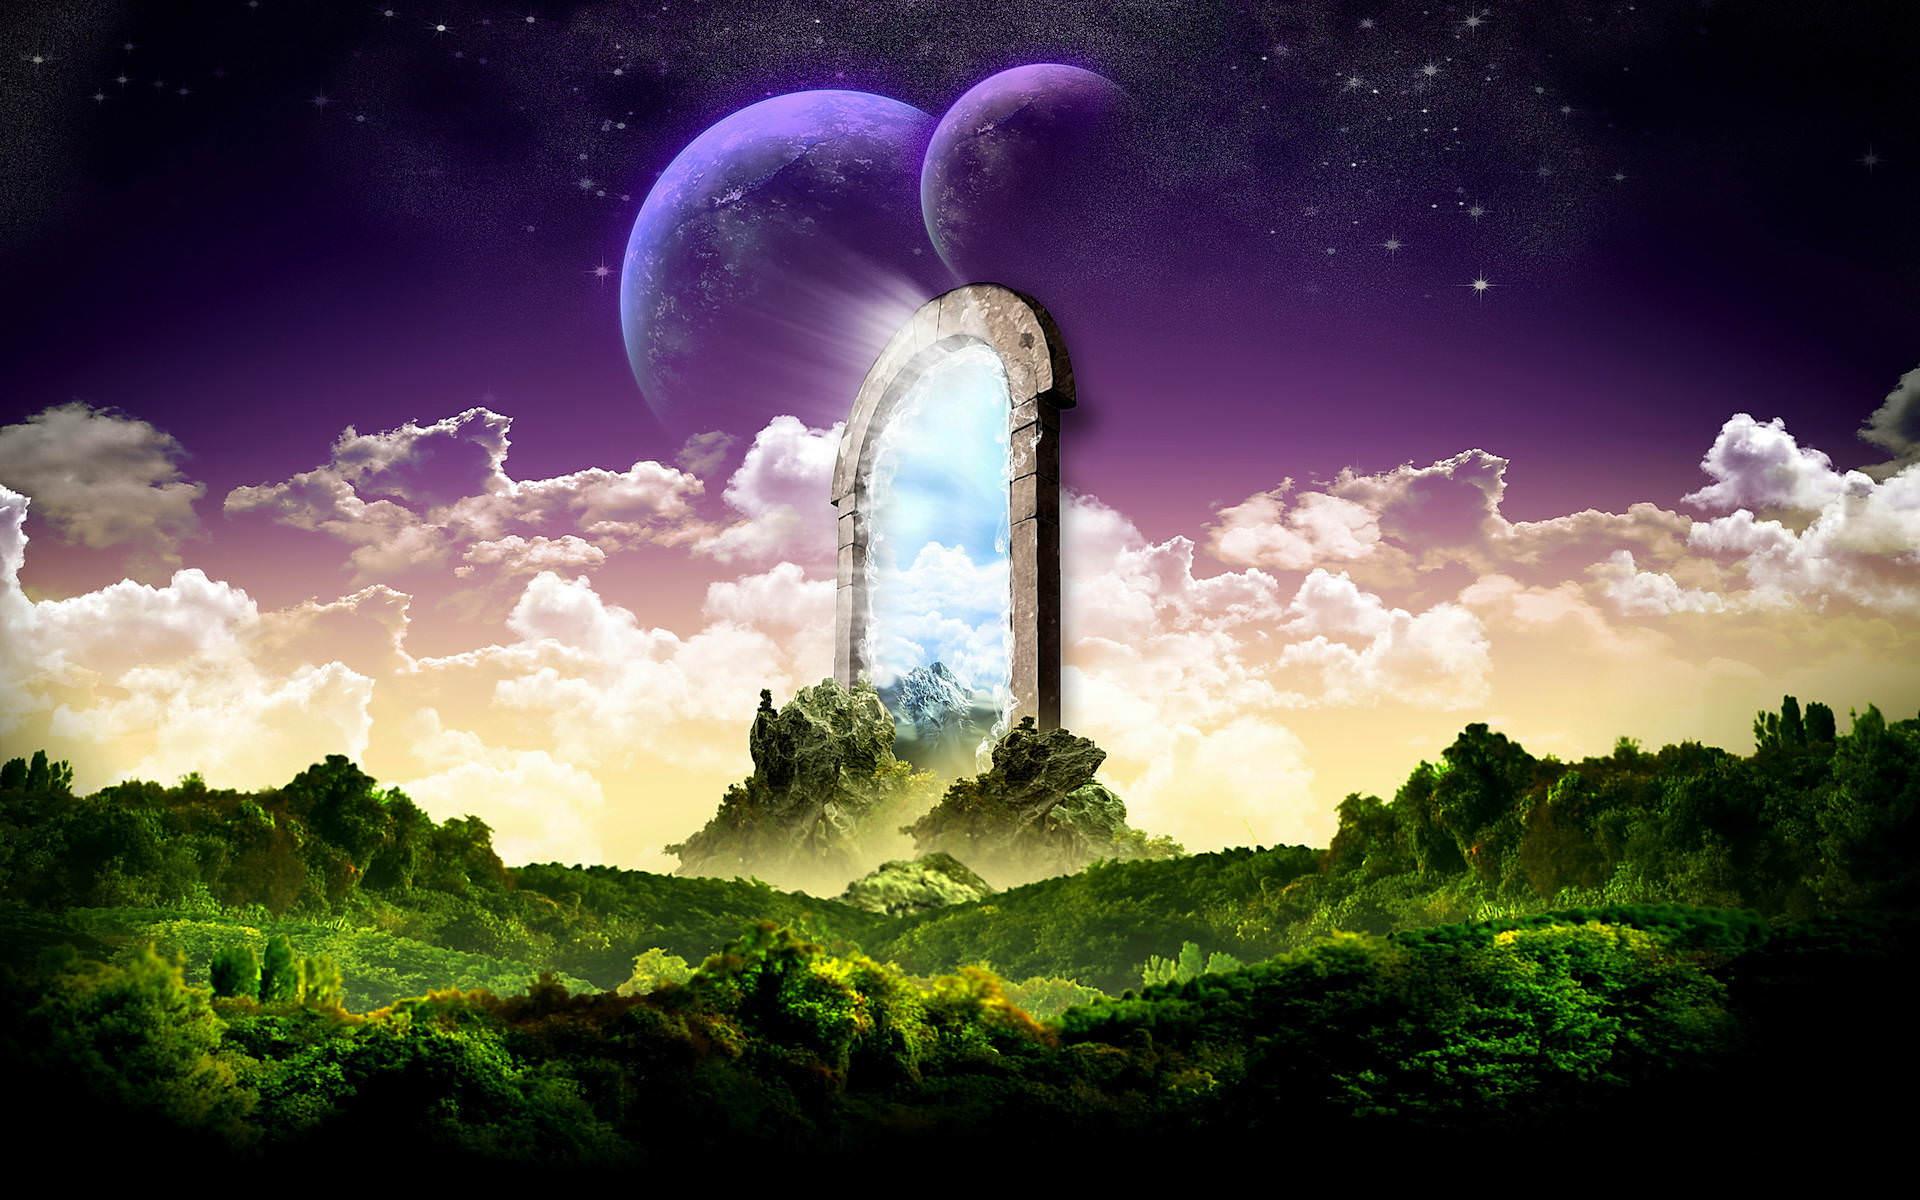 landscape Stars Magical Background